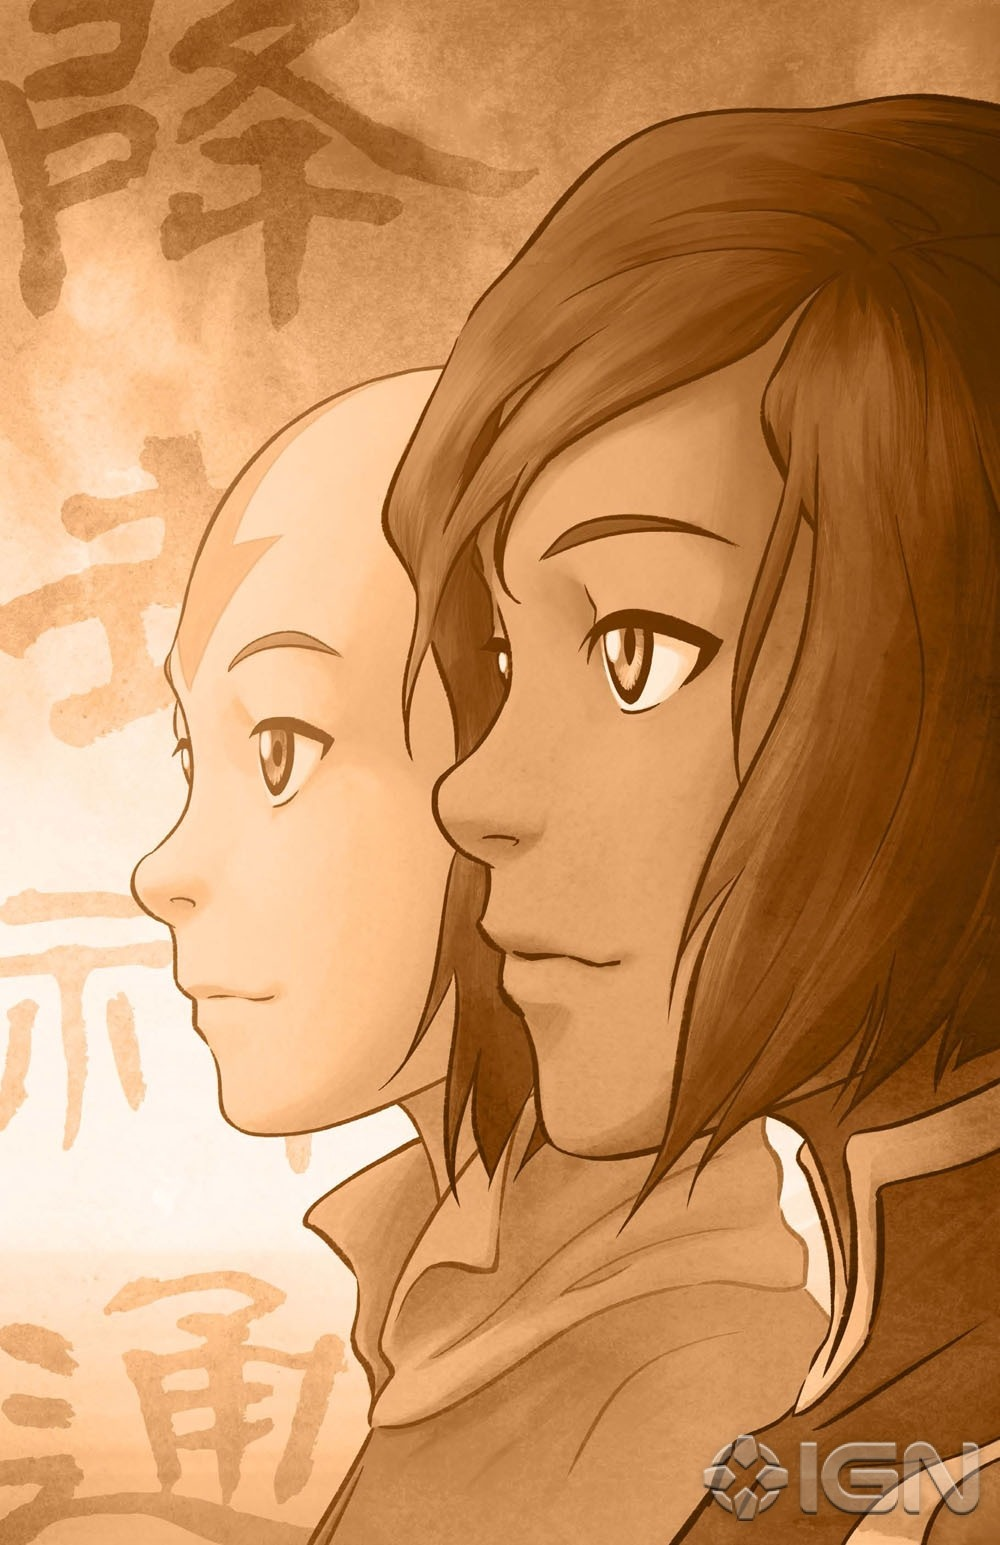 korra last of Avatar the airbender legend